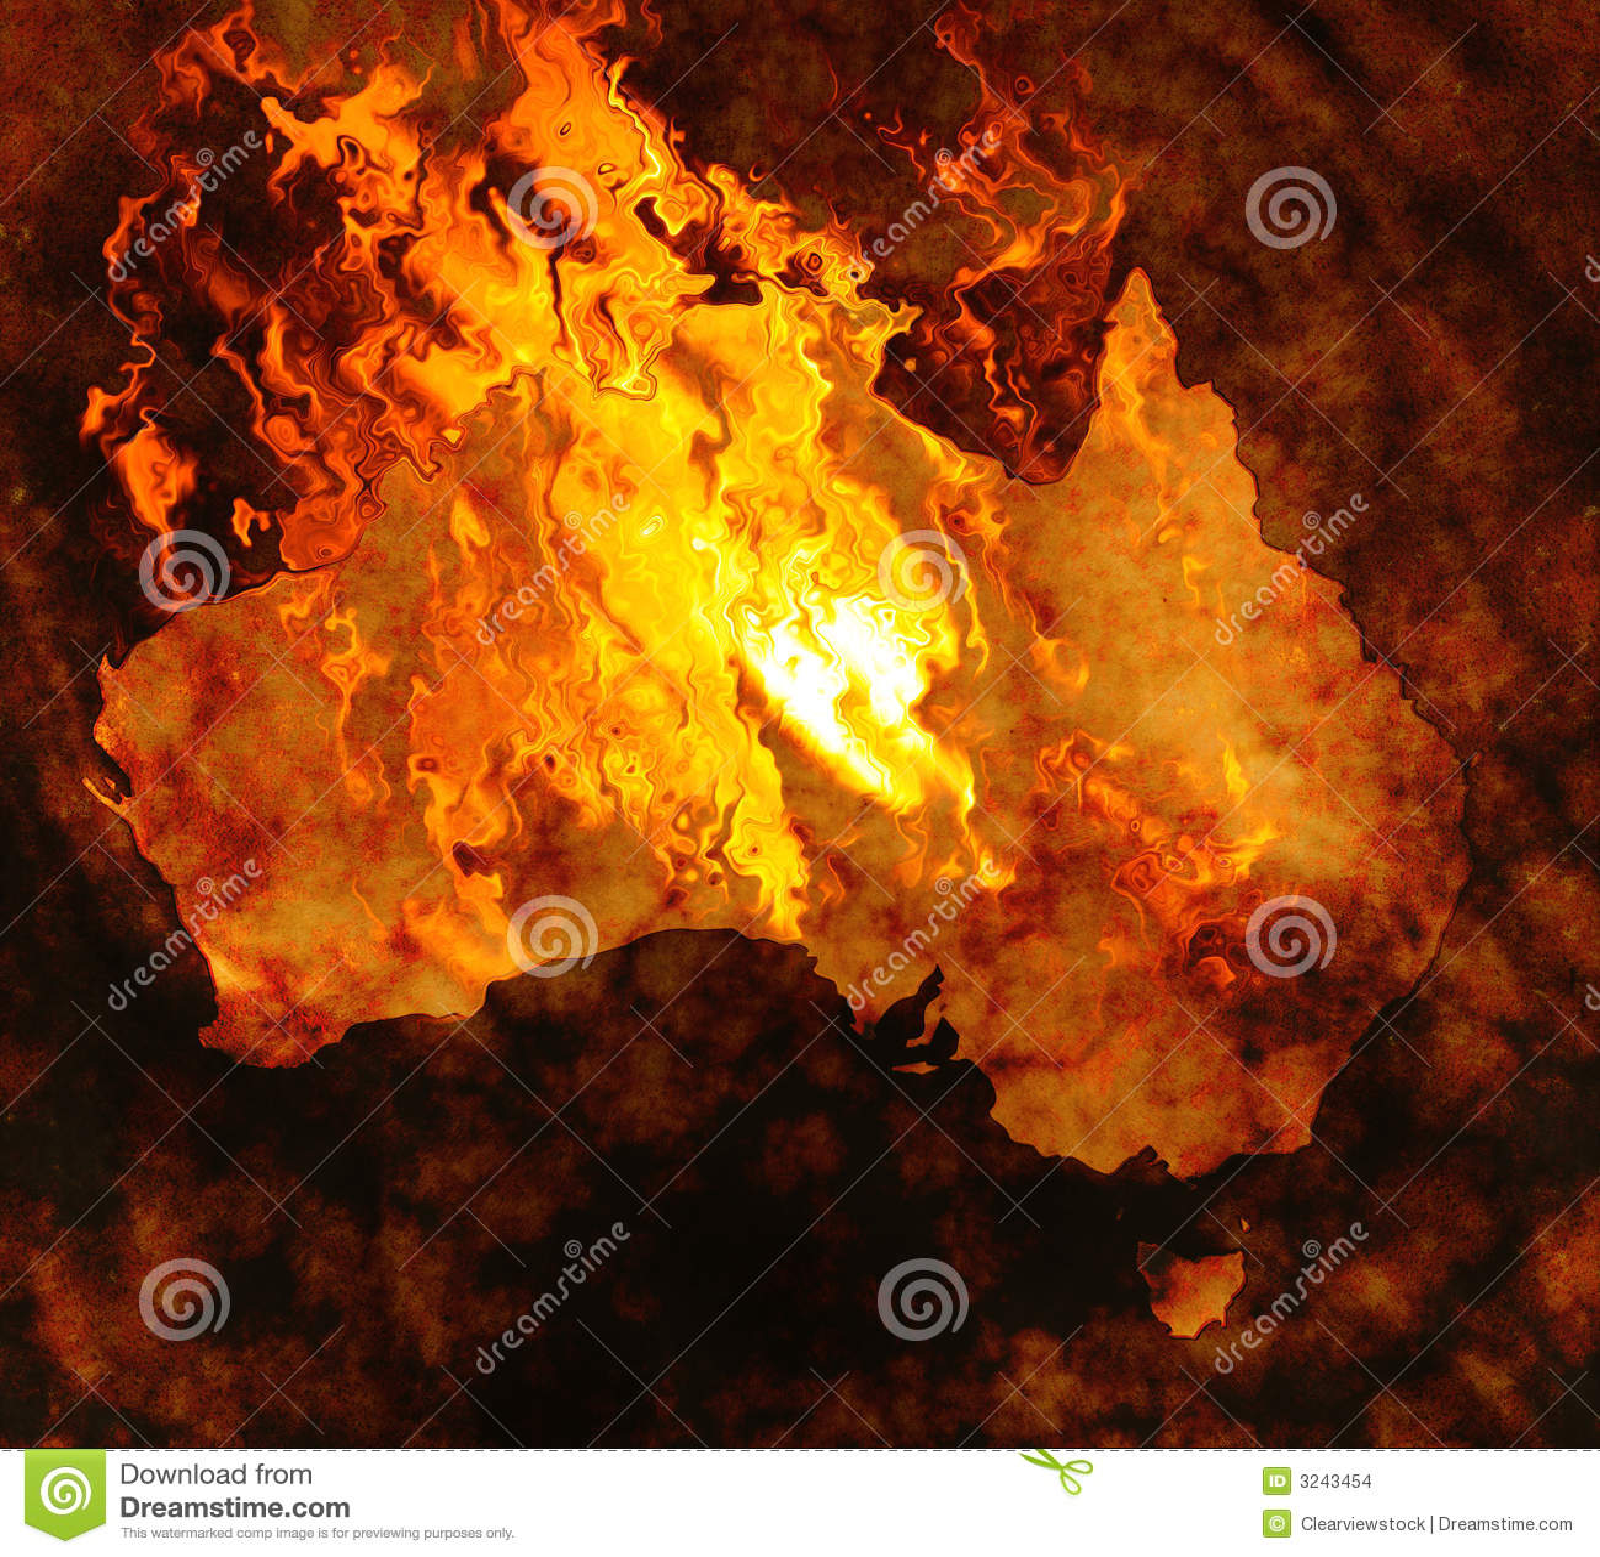 Australia map on fire stock vector. Illustration of design - 3243454